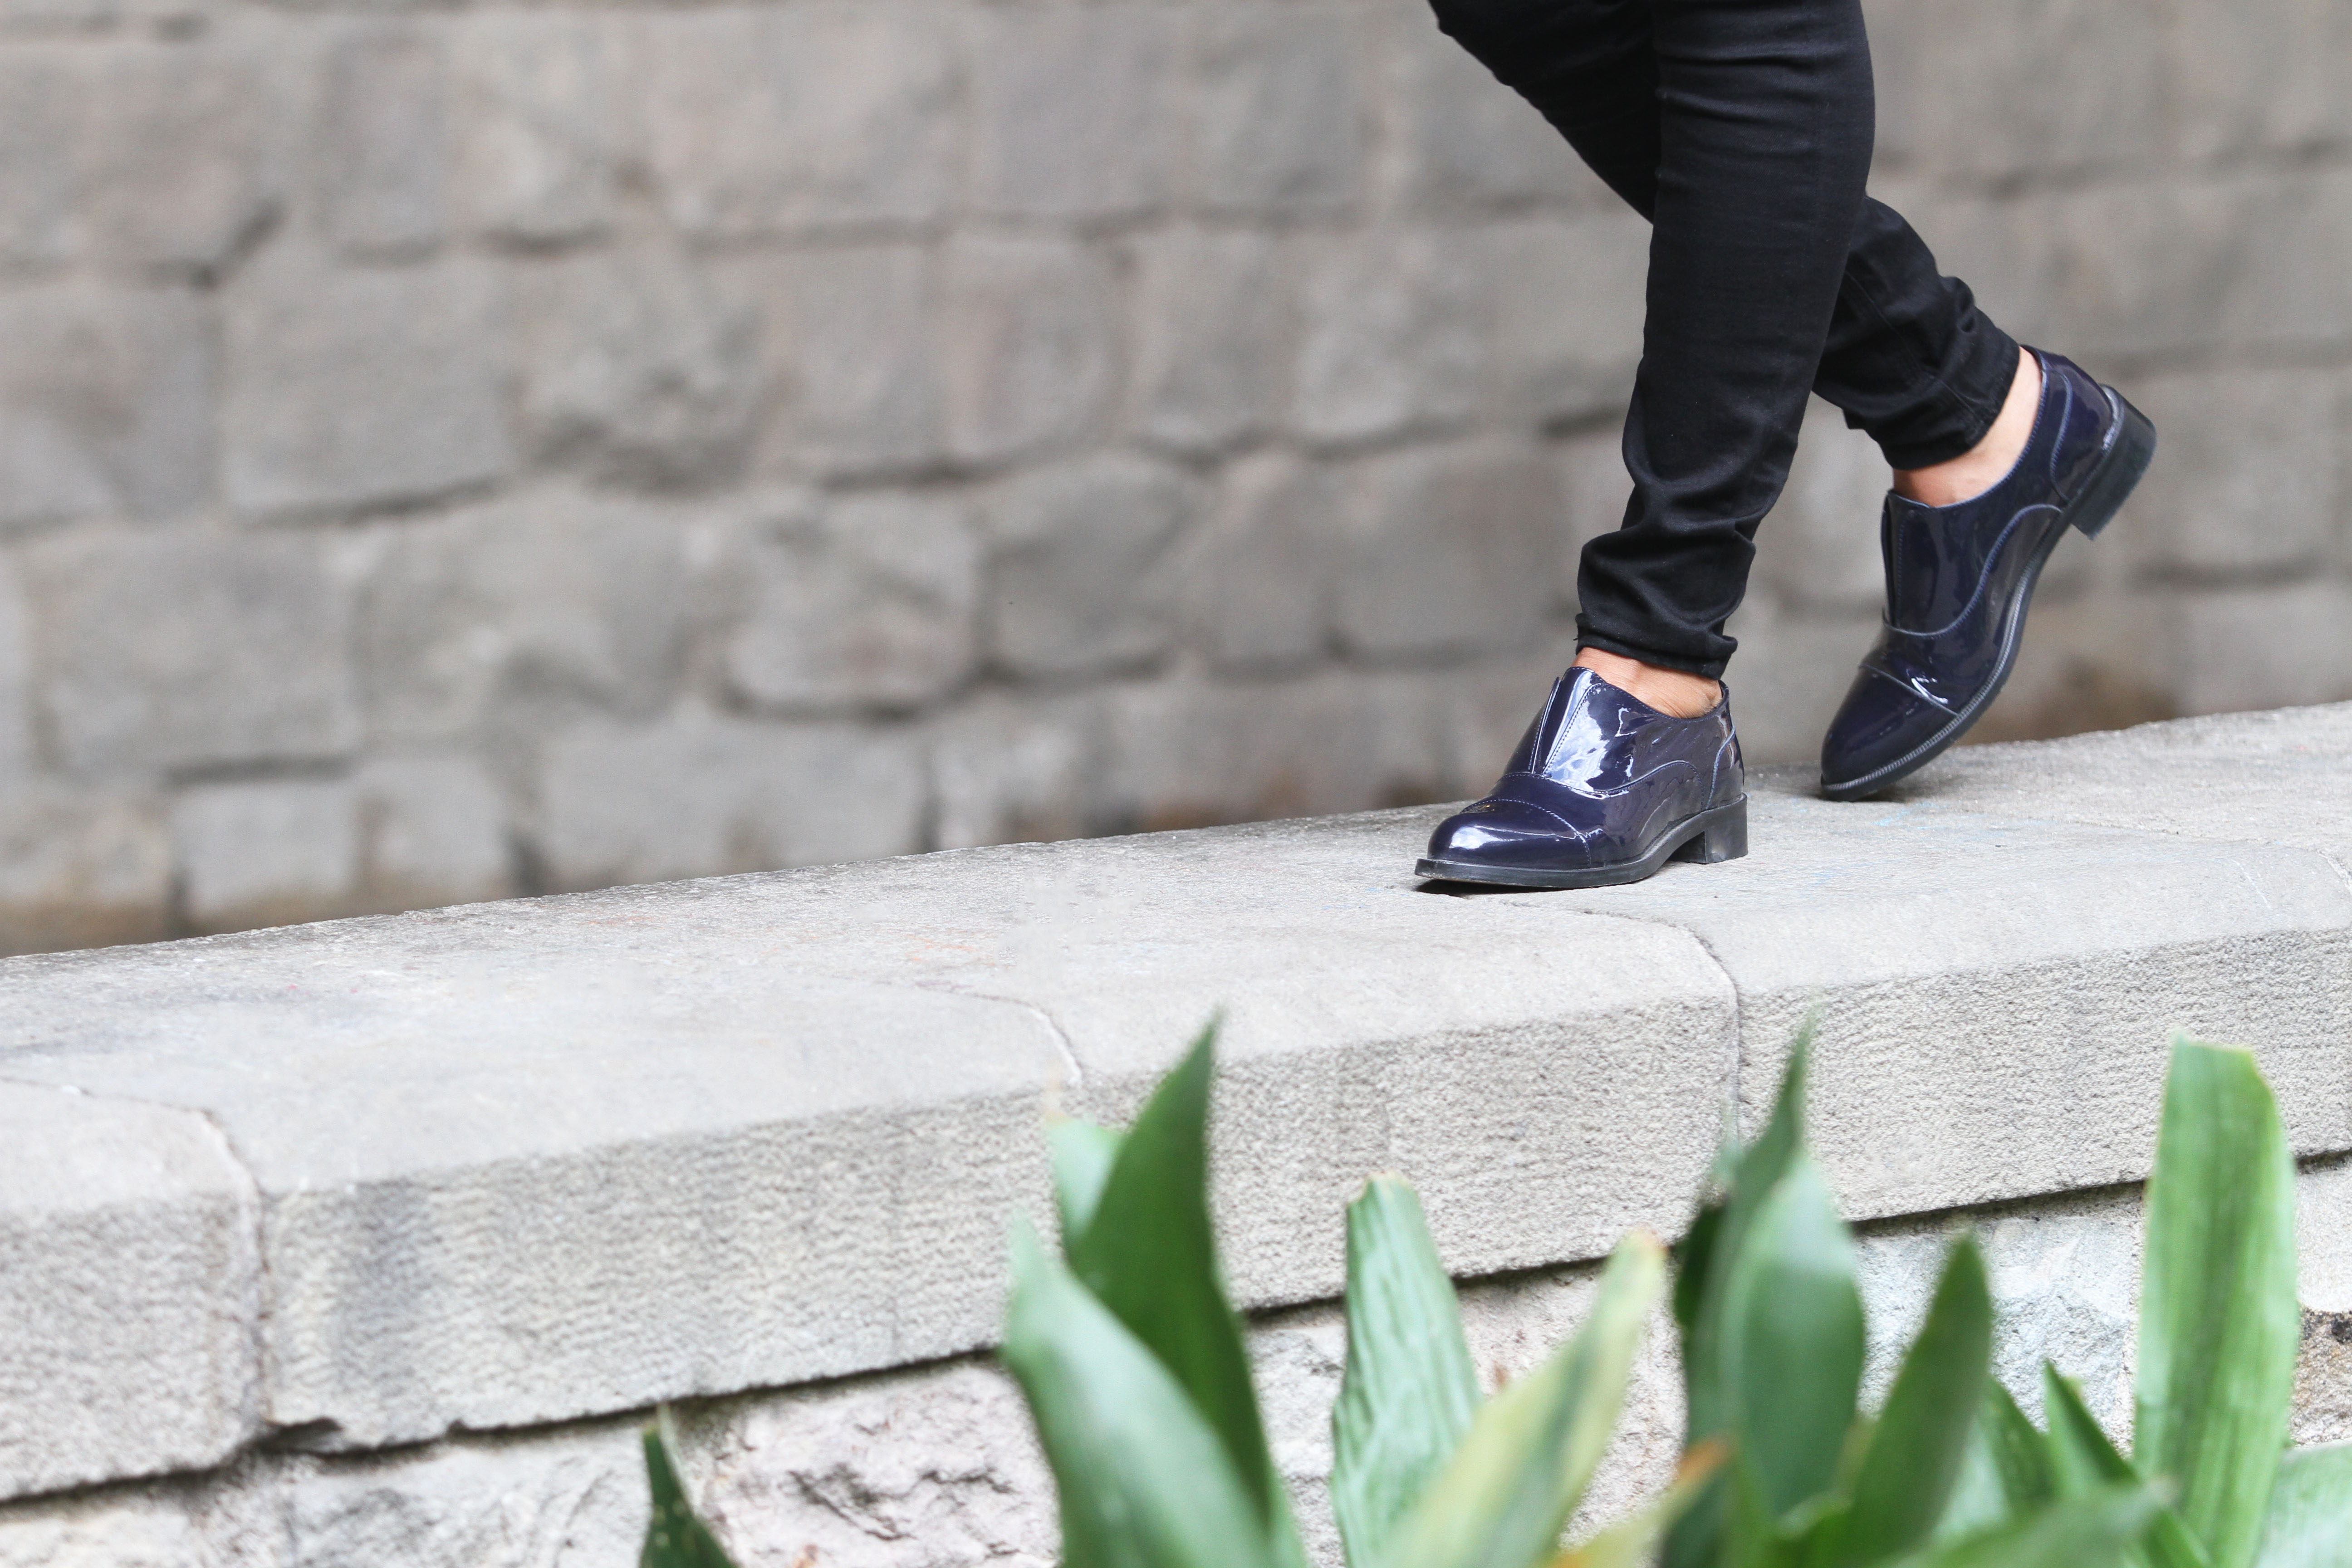 Jules & Jenn les collections chaussures femme derbies